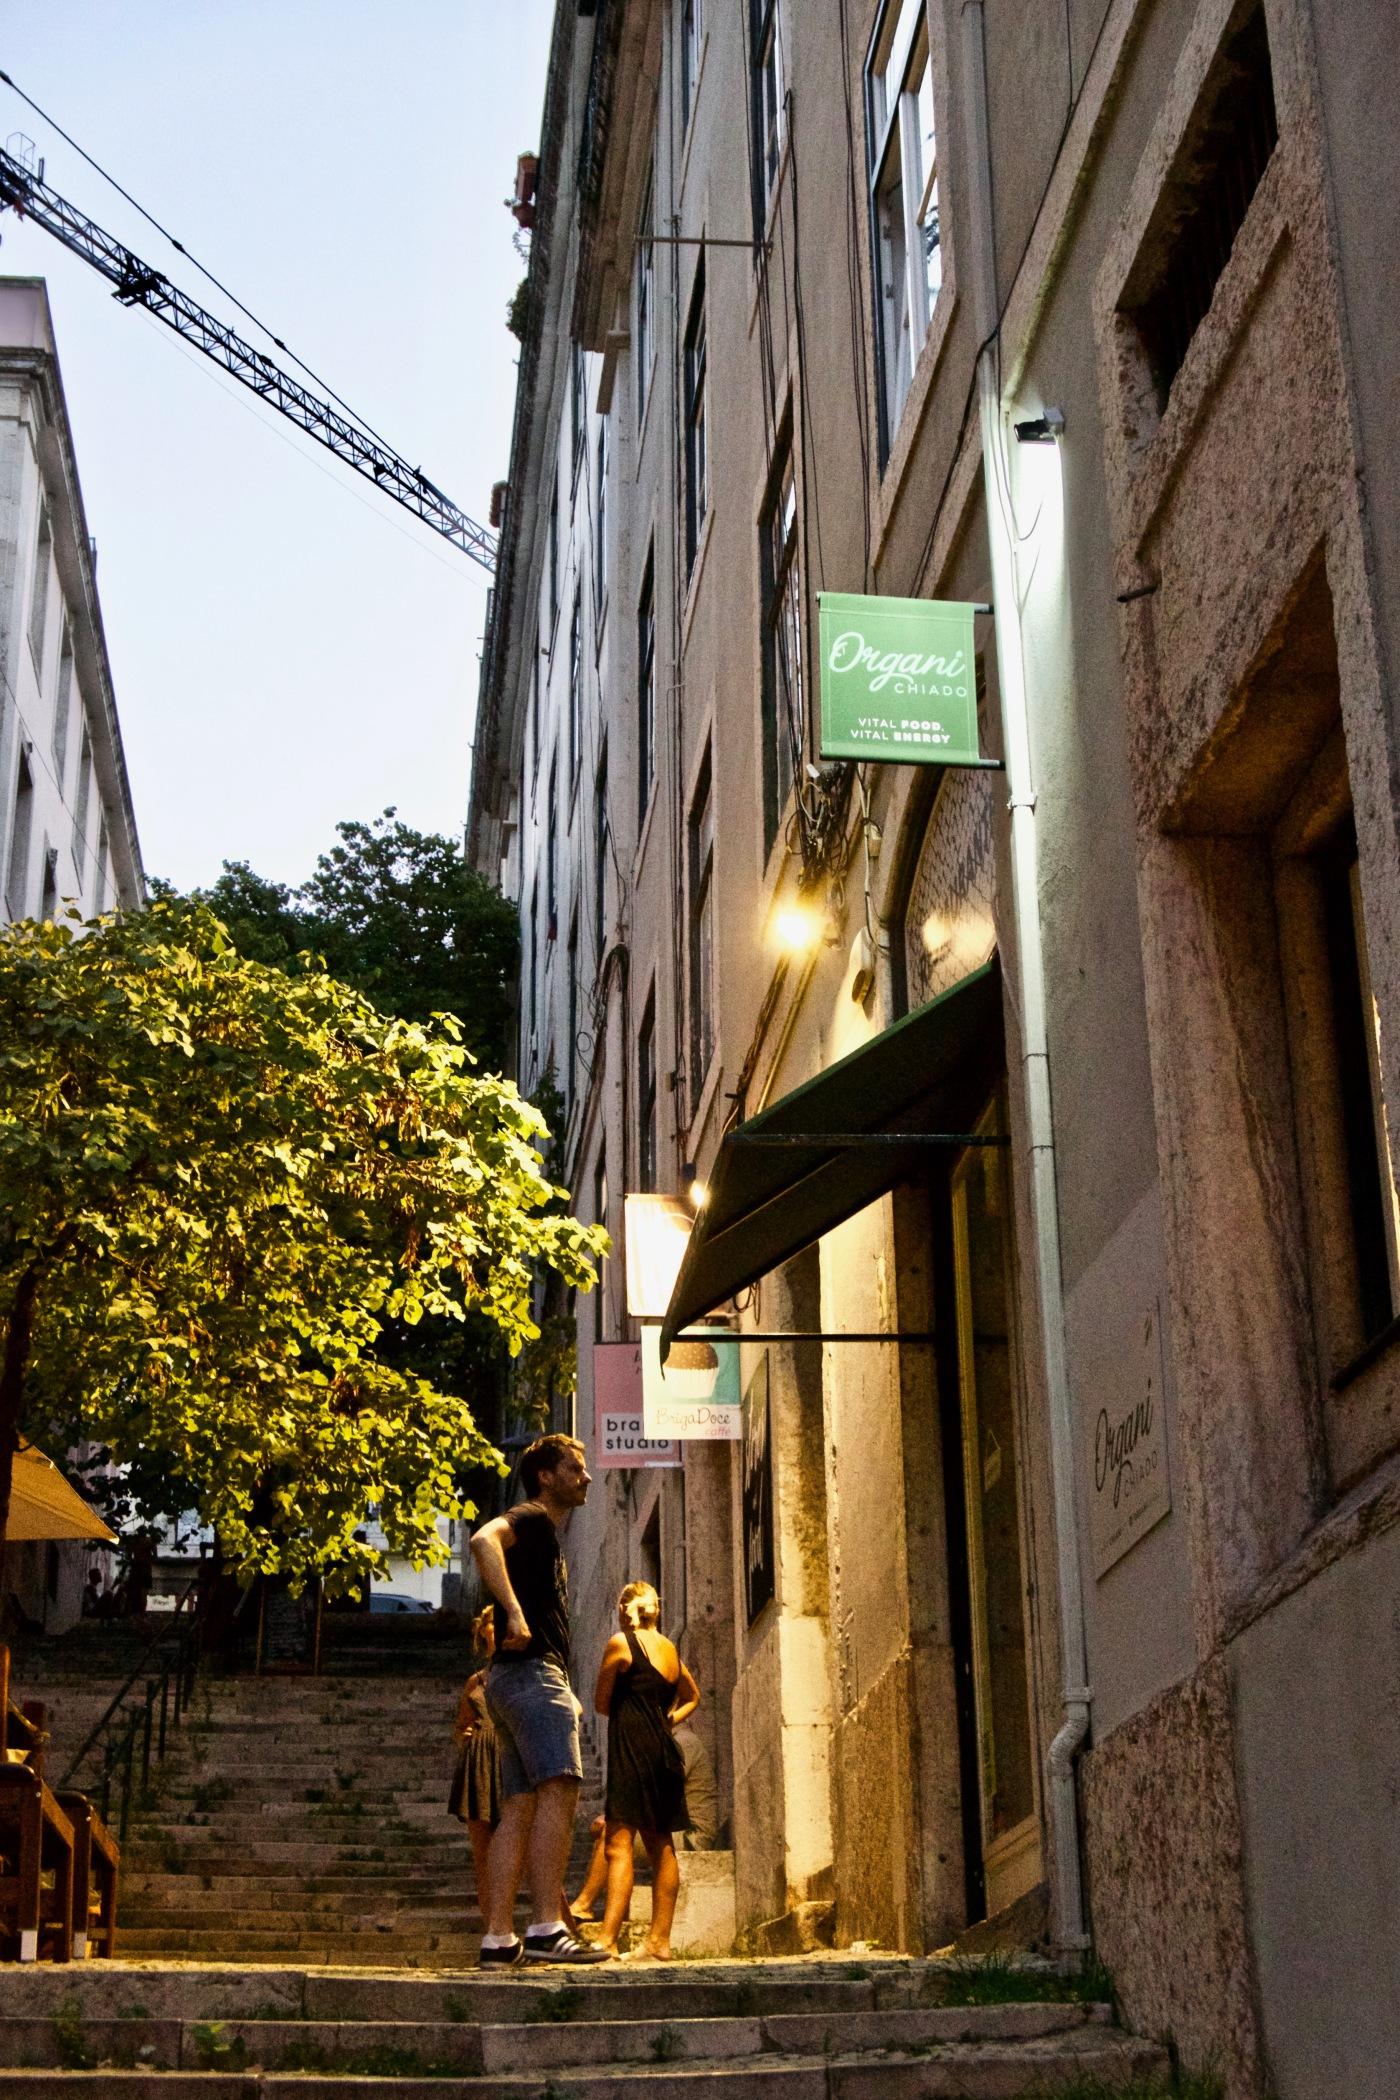 Organi Chiado, Lisbonne